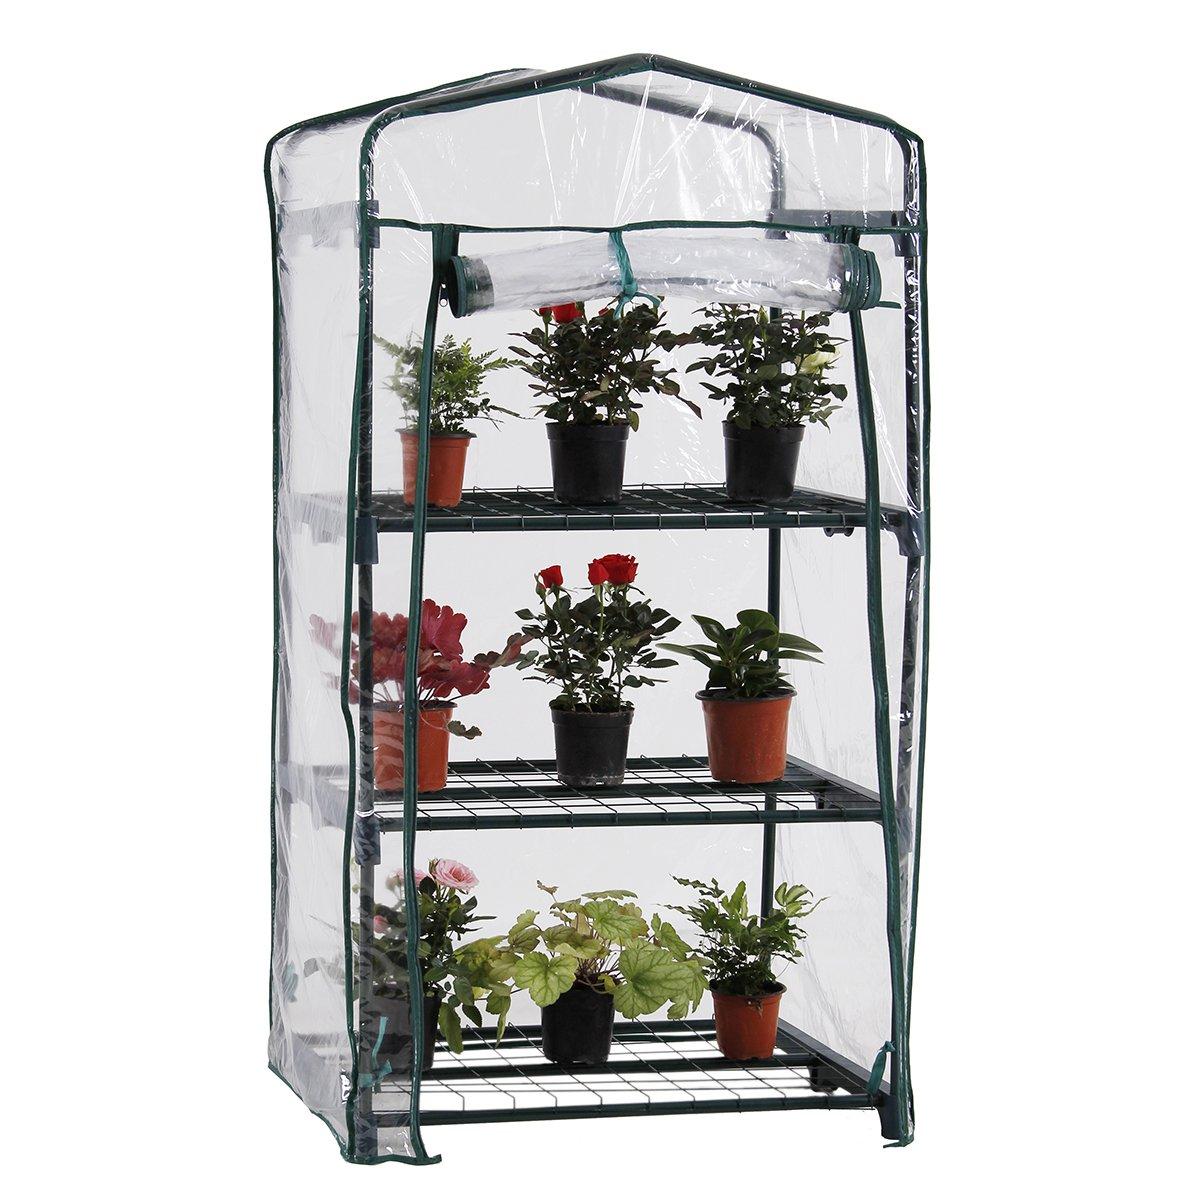 PHI VILLA Outdoor Portable Garden 3 Tier Mini Greenhouse with Clean Cover, 27.2''x19.3''x50.8''